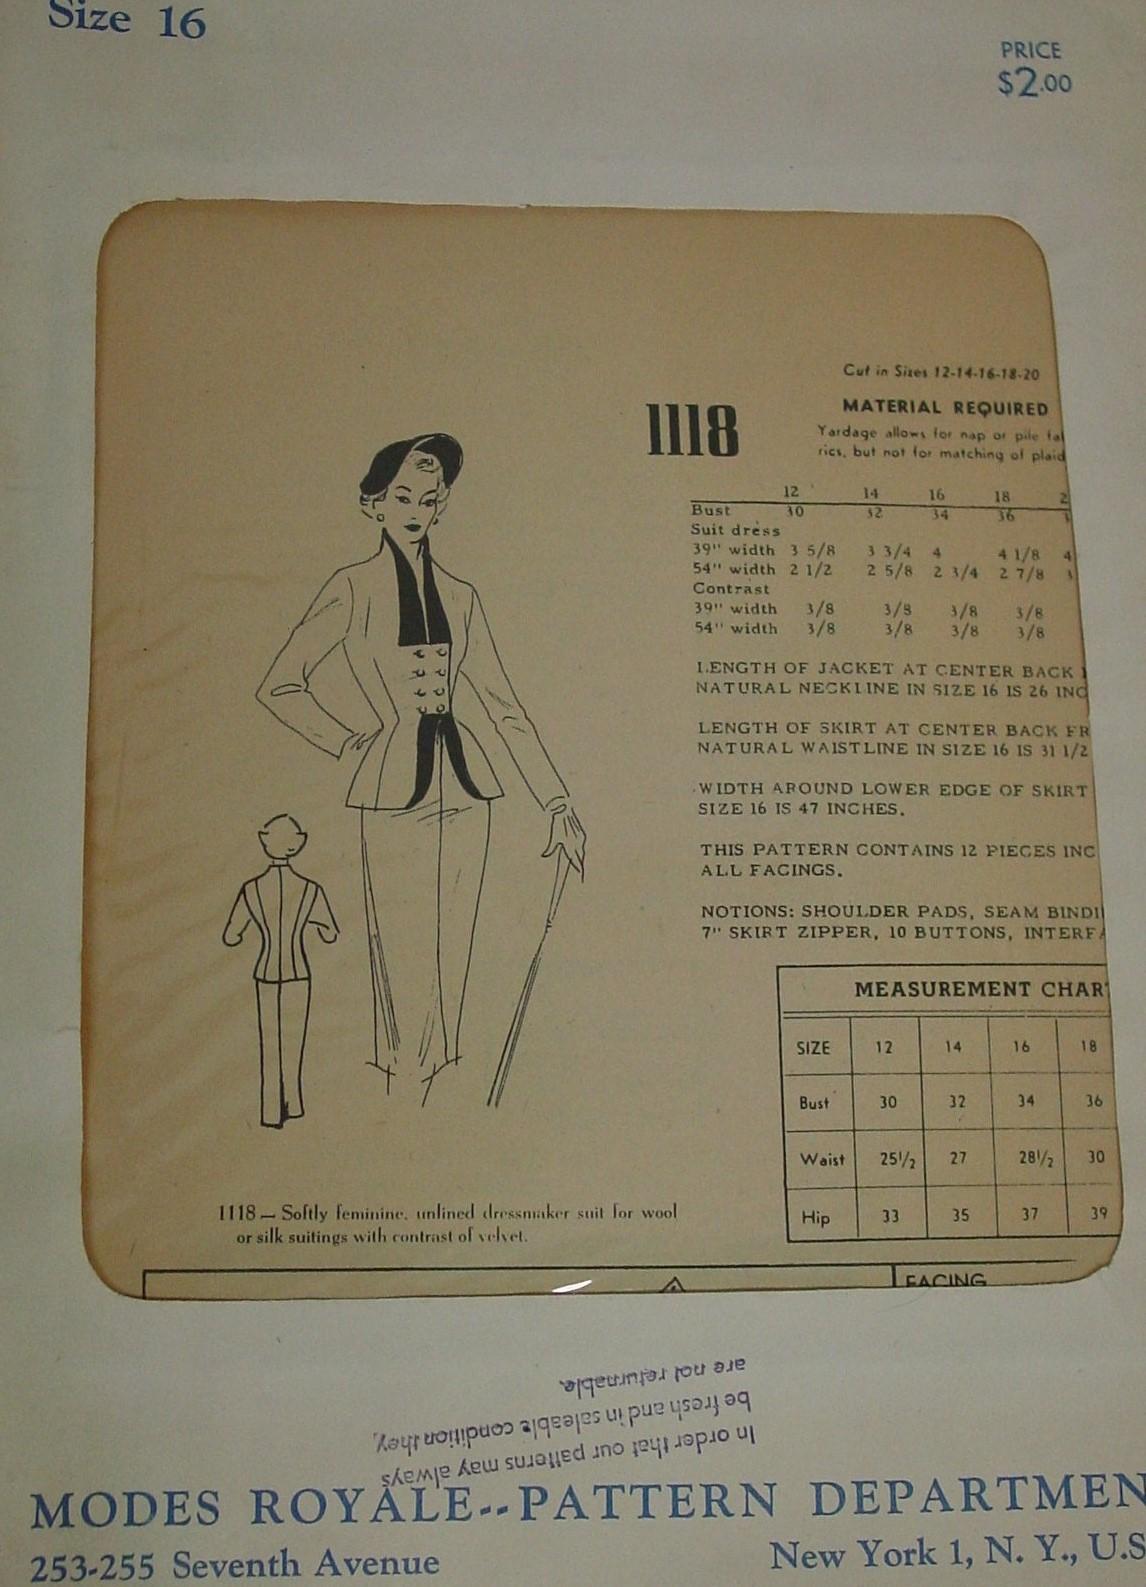 Modes Royale 1118